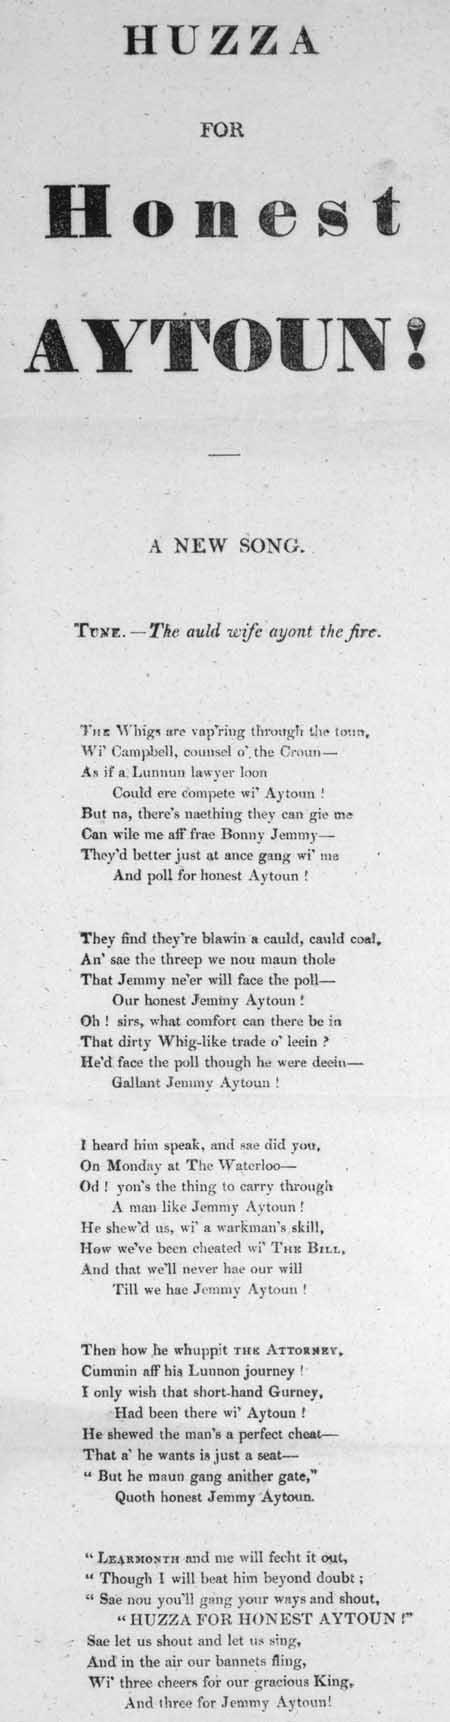 Broadside ballad entitled 'Huzza for Honest Aytoun!'